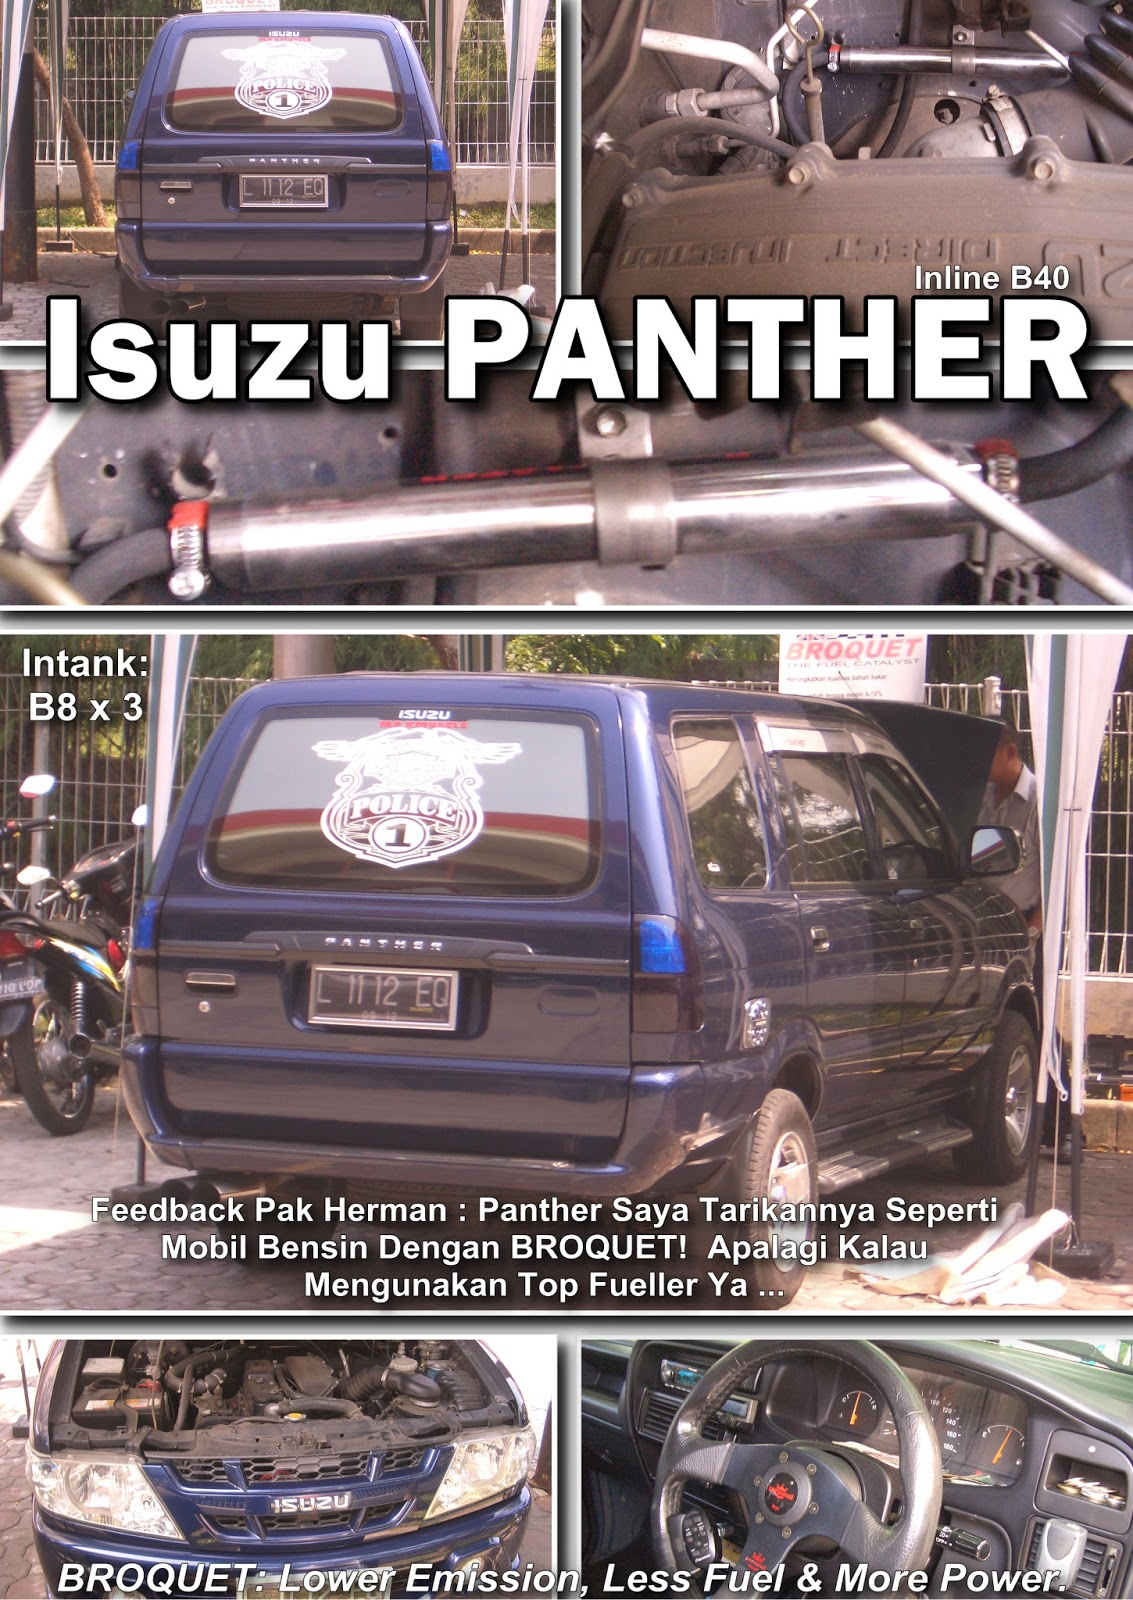 ... , KOMUNITAS ISUZU PANTHER: Membuat Panther Bertenaga Dan Irit 57.5%